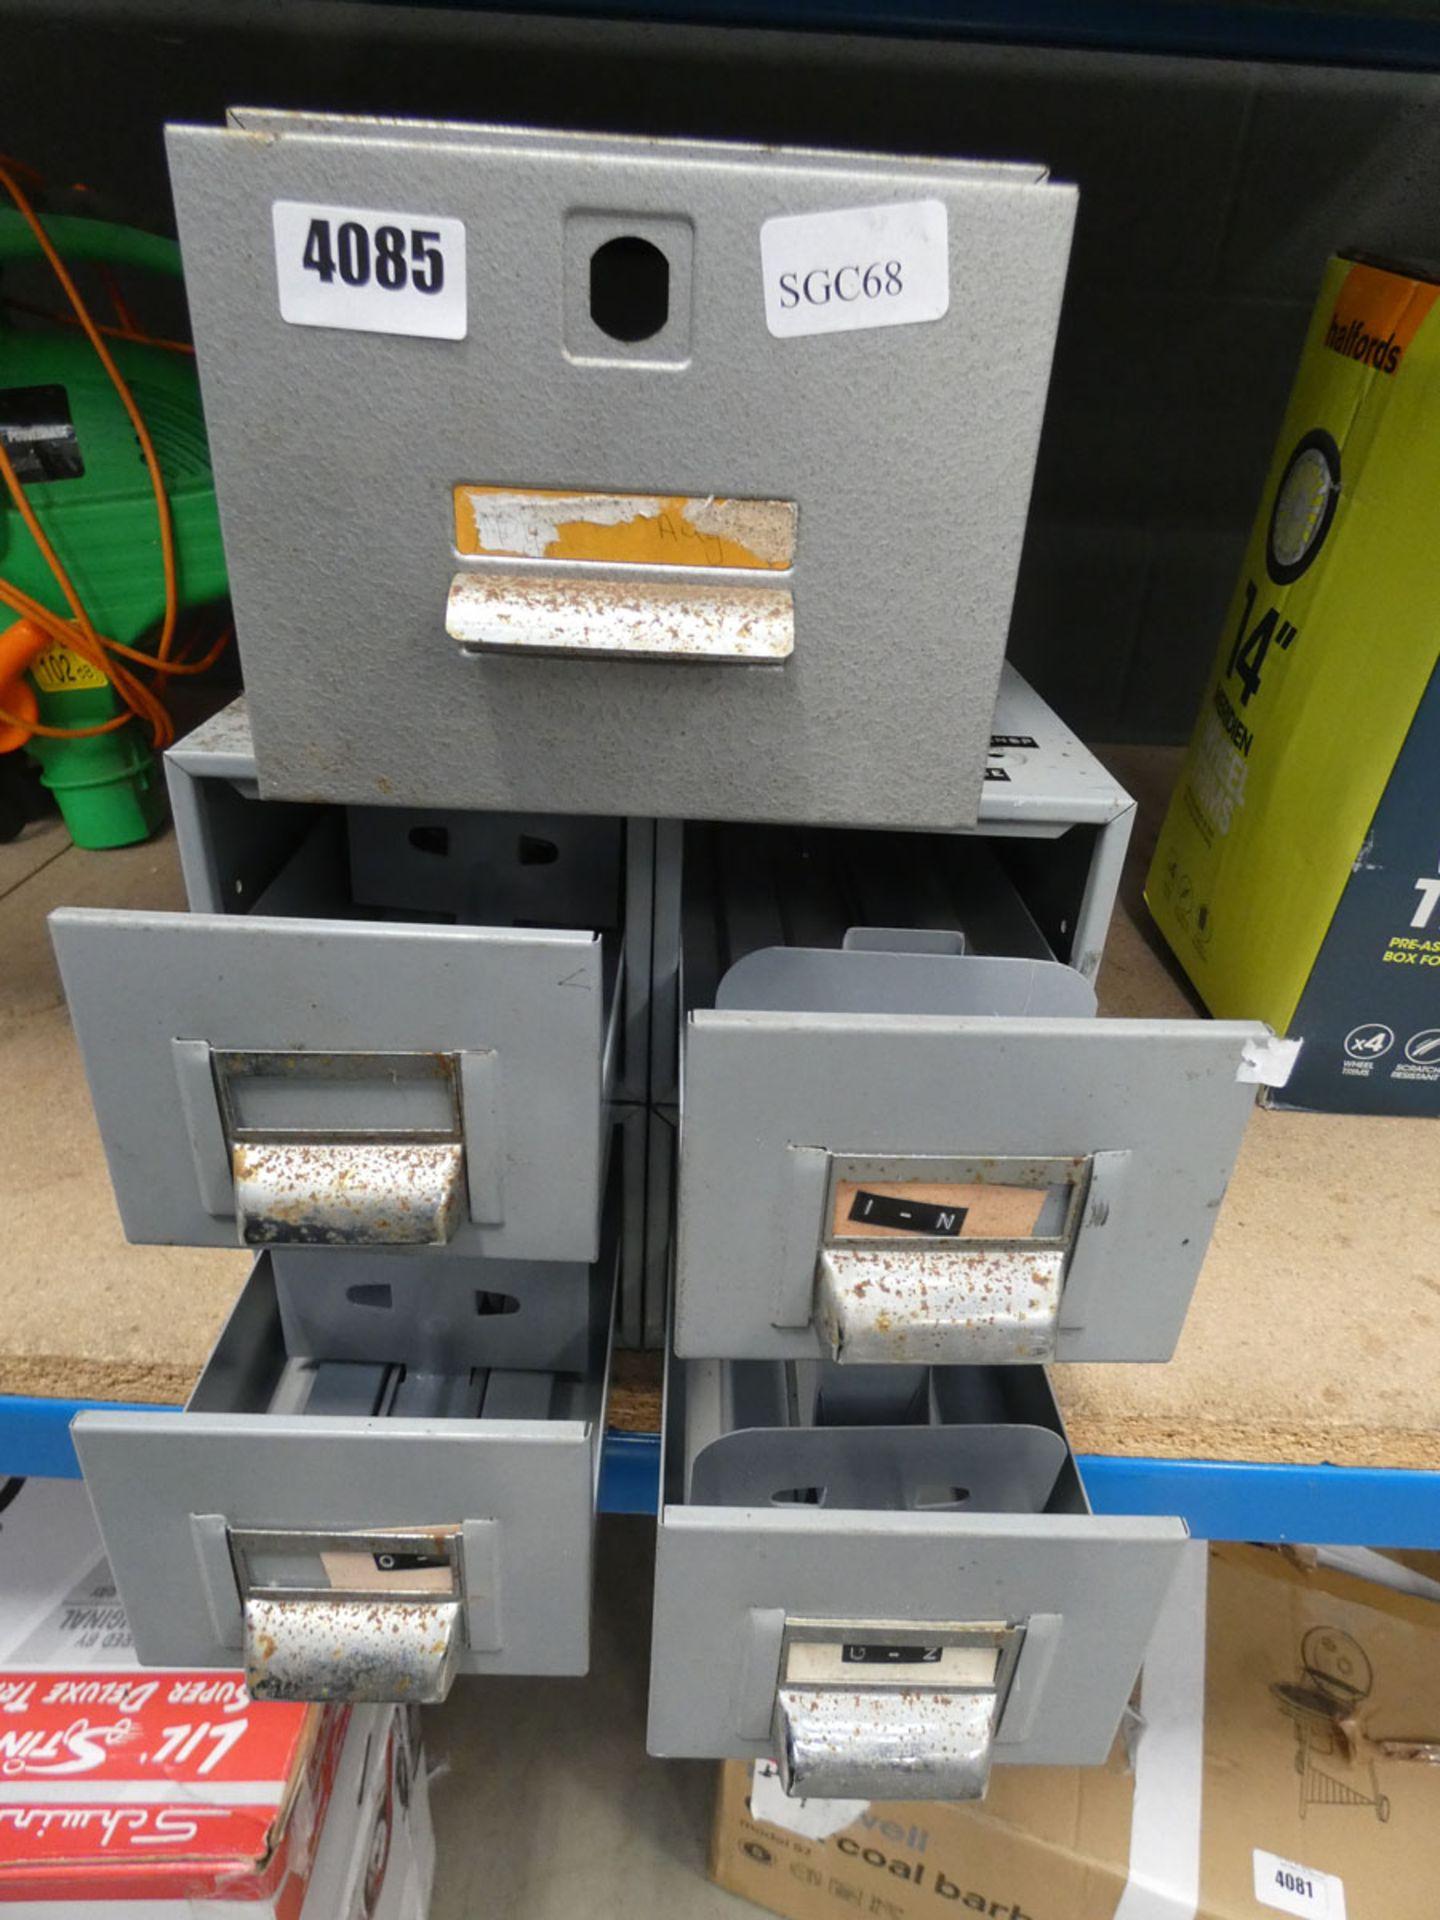 2 metal file card trays